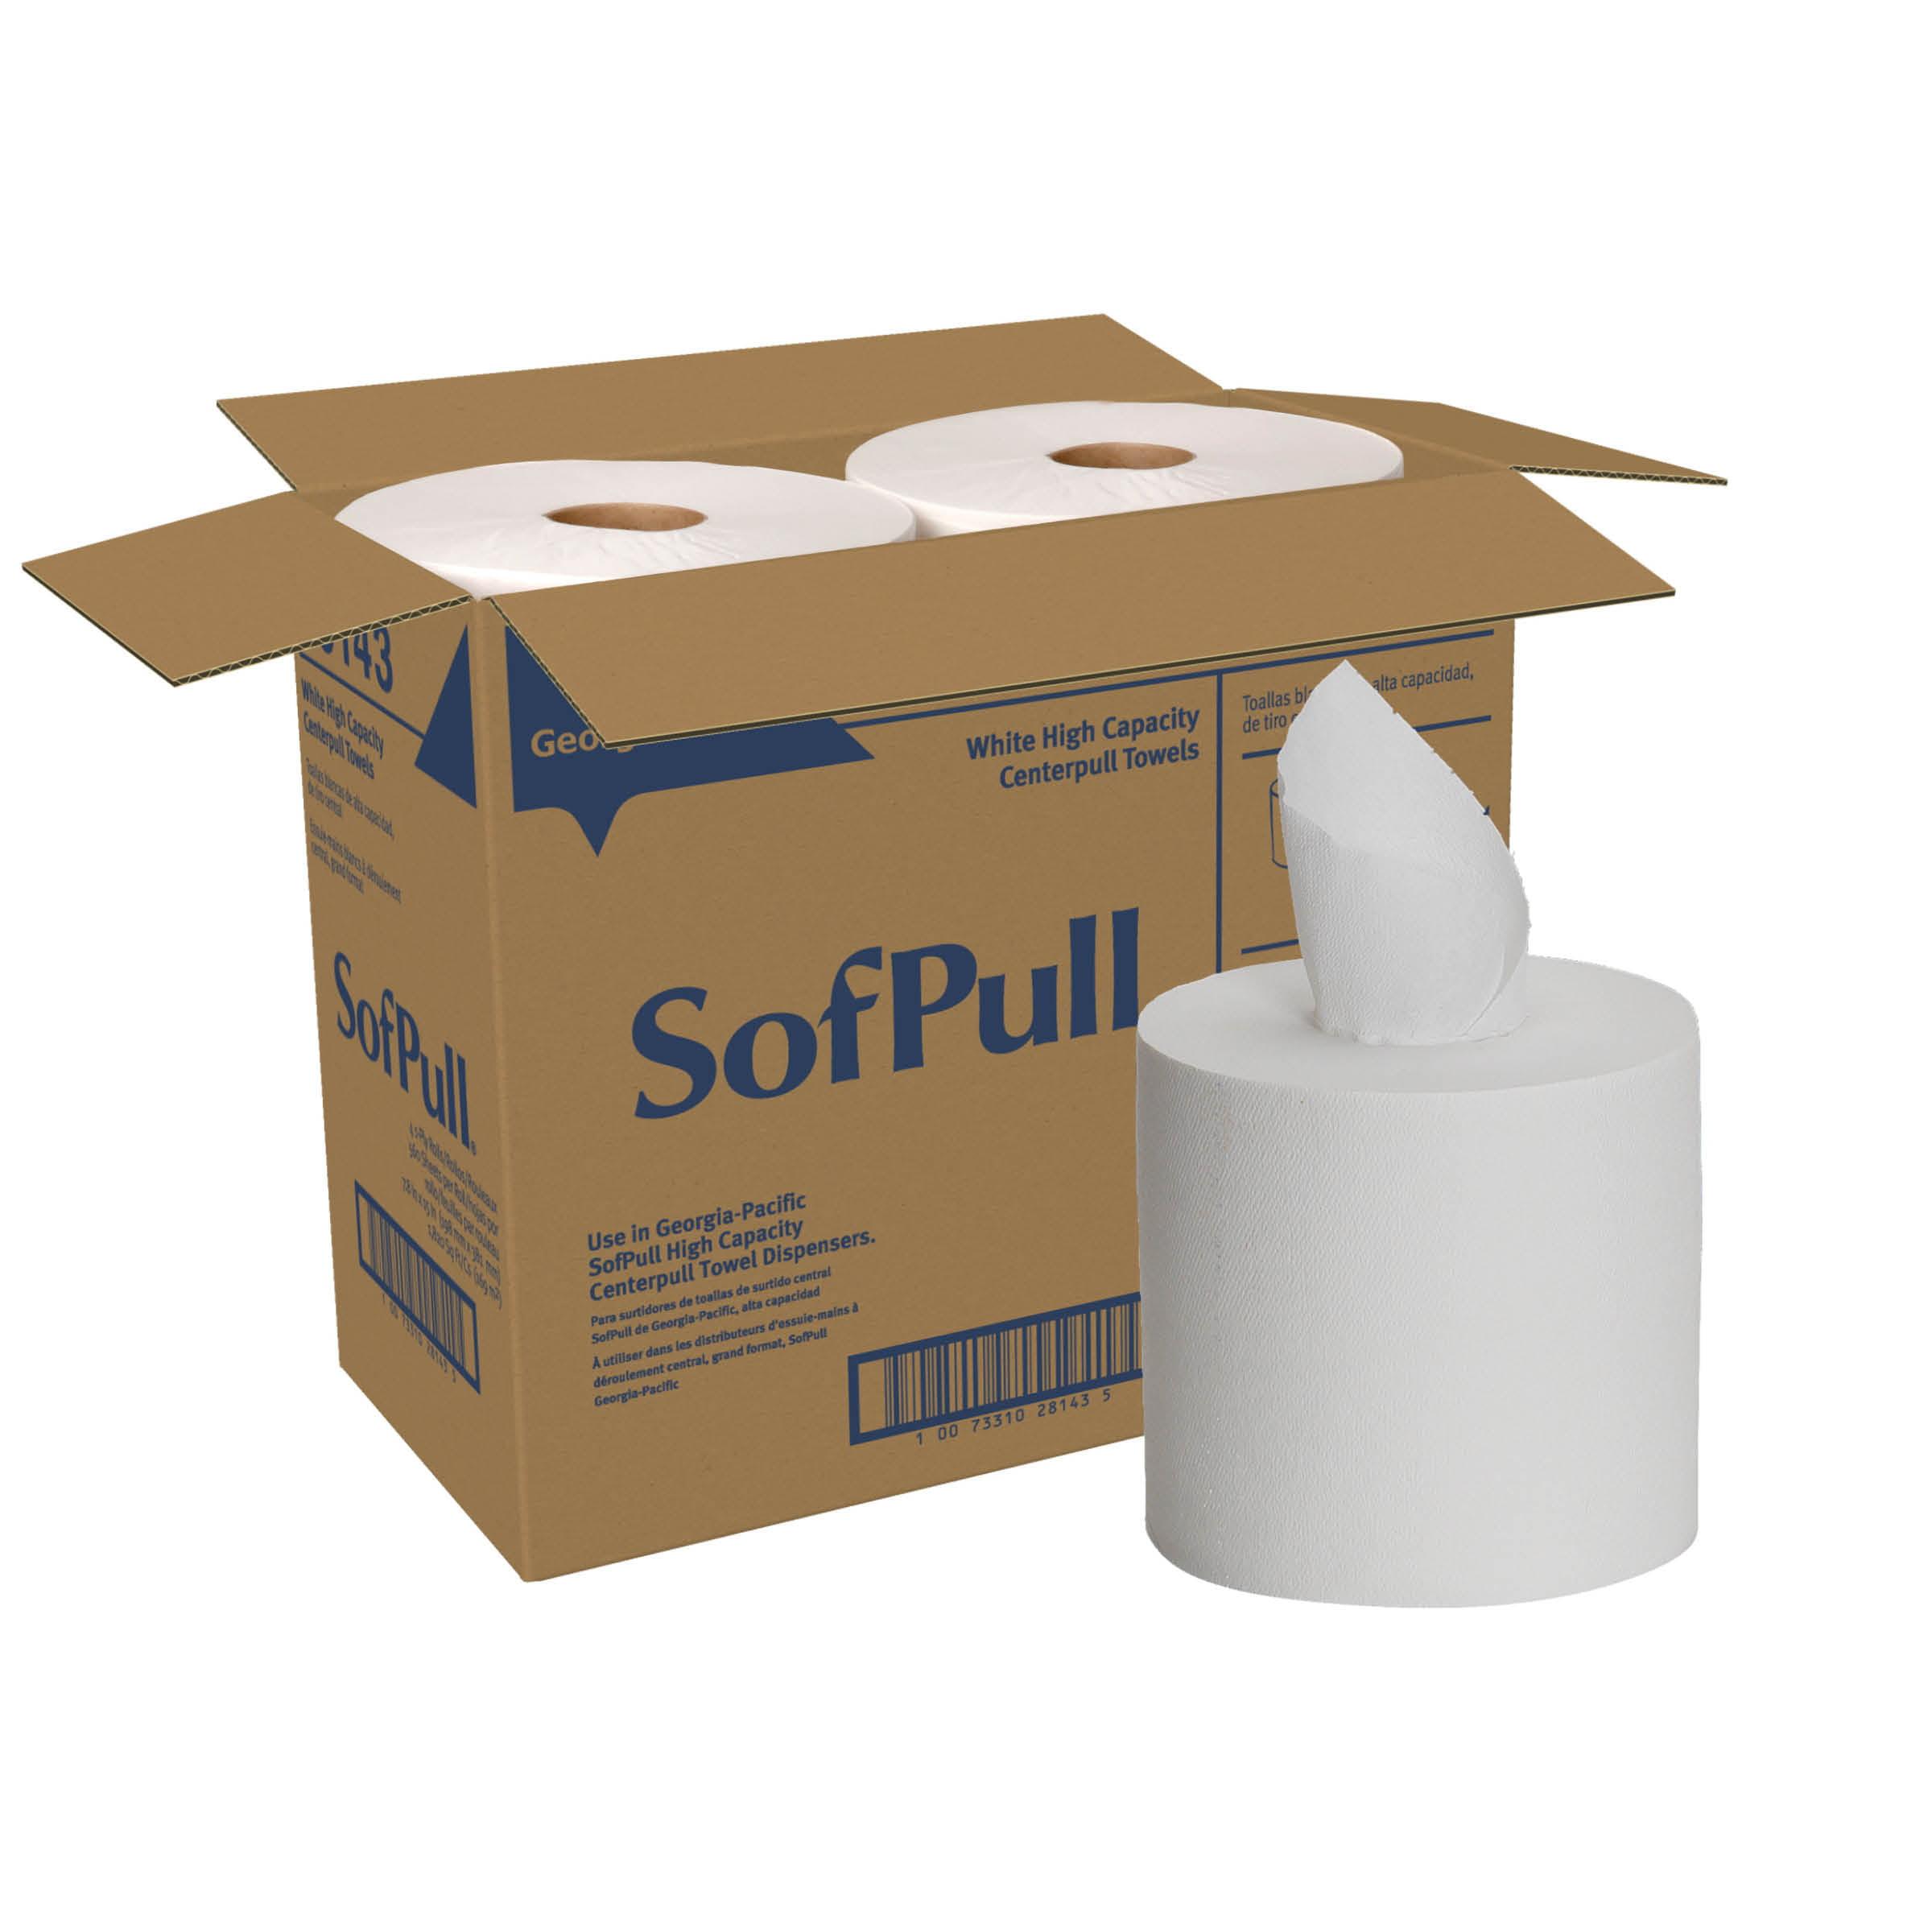 SofPull® (28143) Centerpull High Capacity Paper Towel by GP PRO (Georgia-Pacific), White, 560 Sheets Per Roll, 4 Rolls Per Case